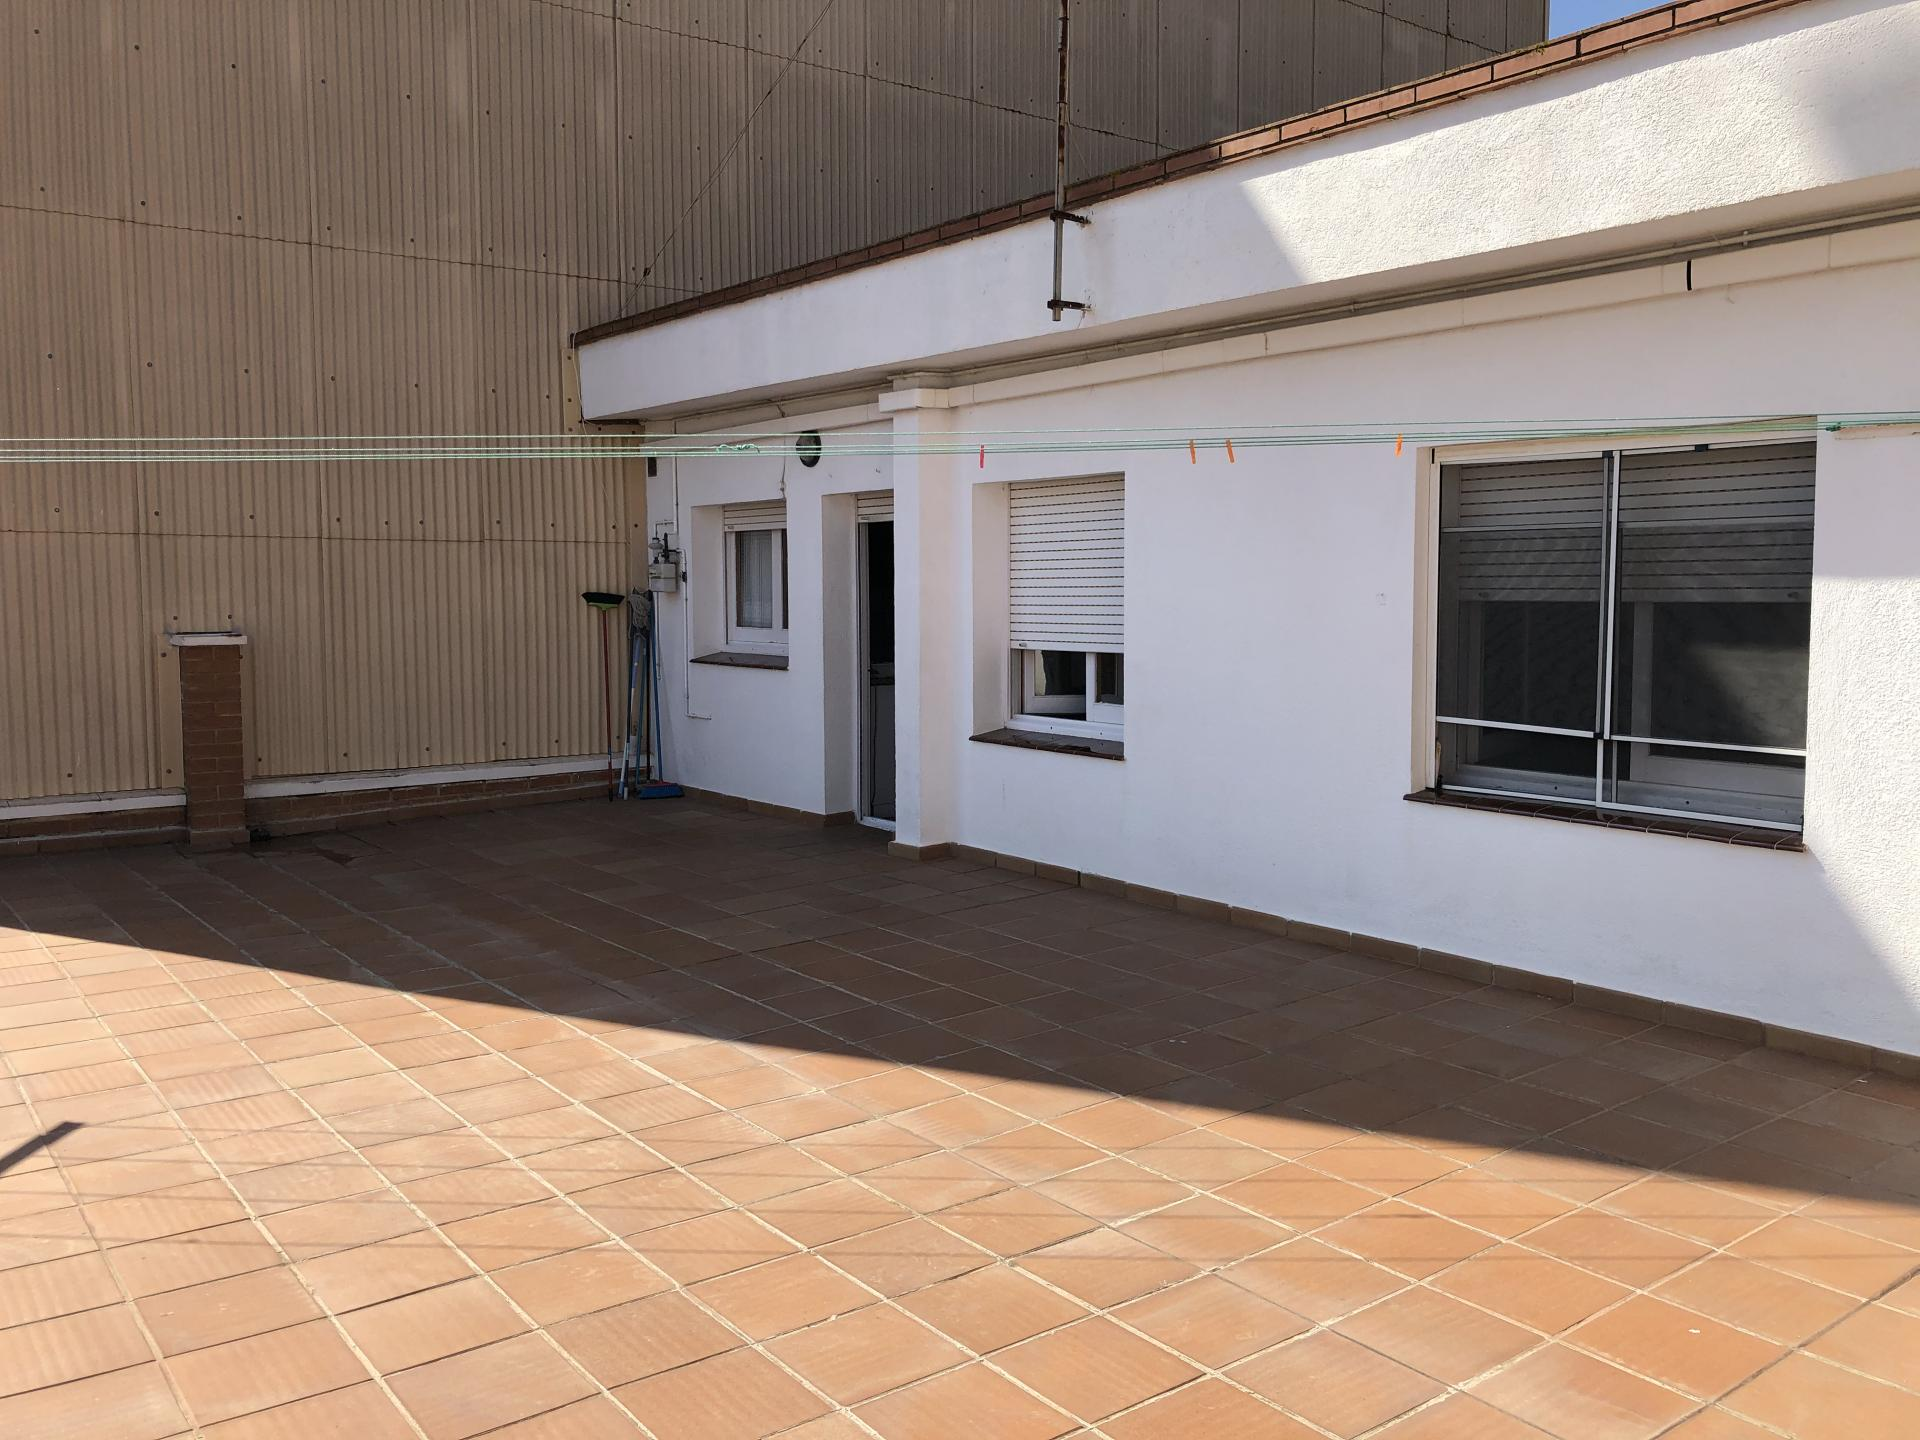 Foto 52 (V-735-2021) - Inmueble en  Venda a Santa Margarida i els Monjos